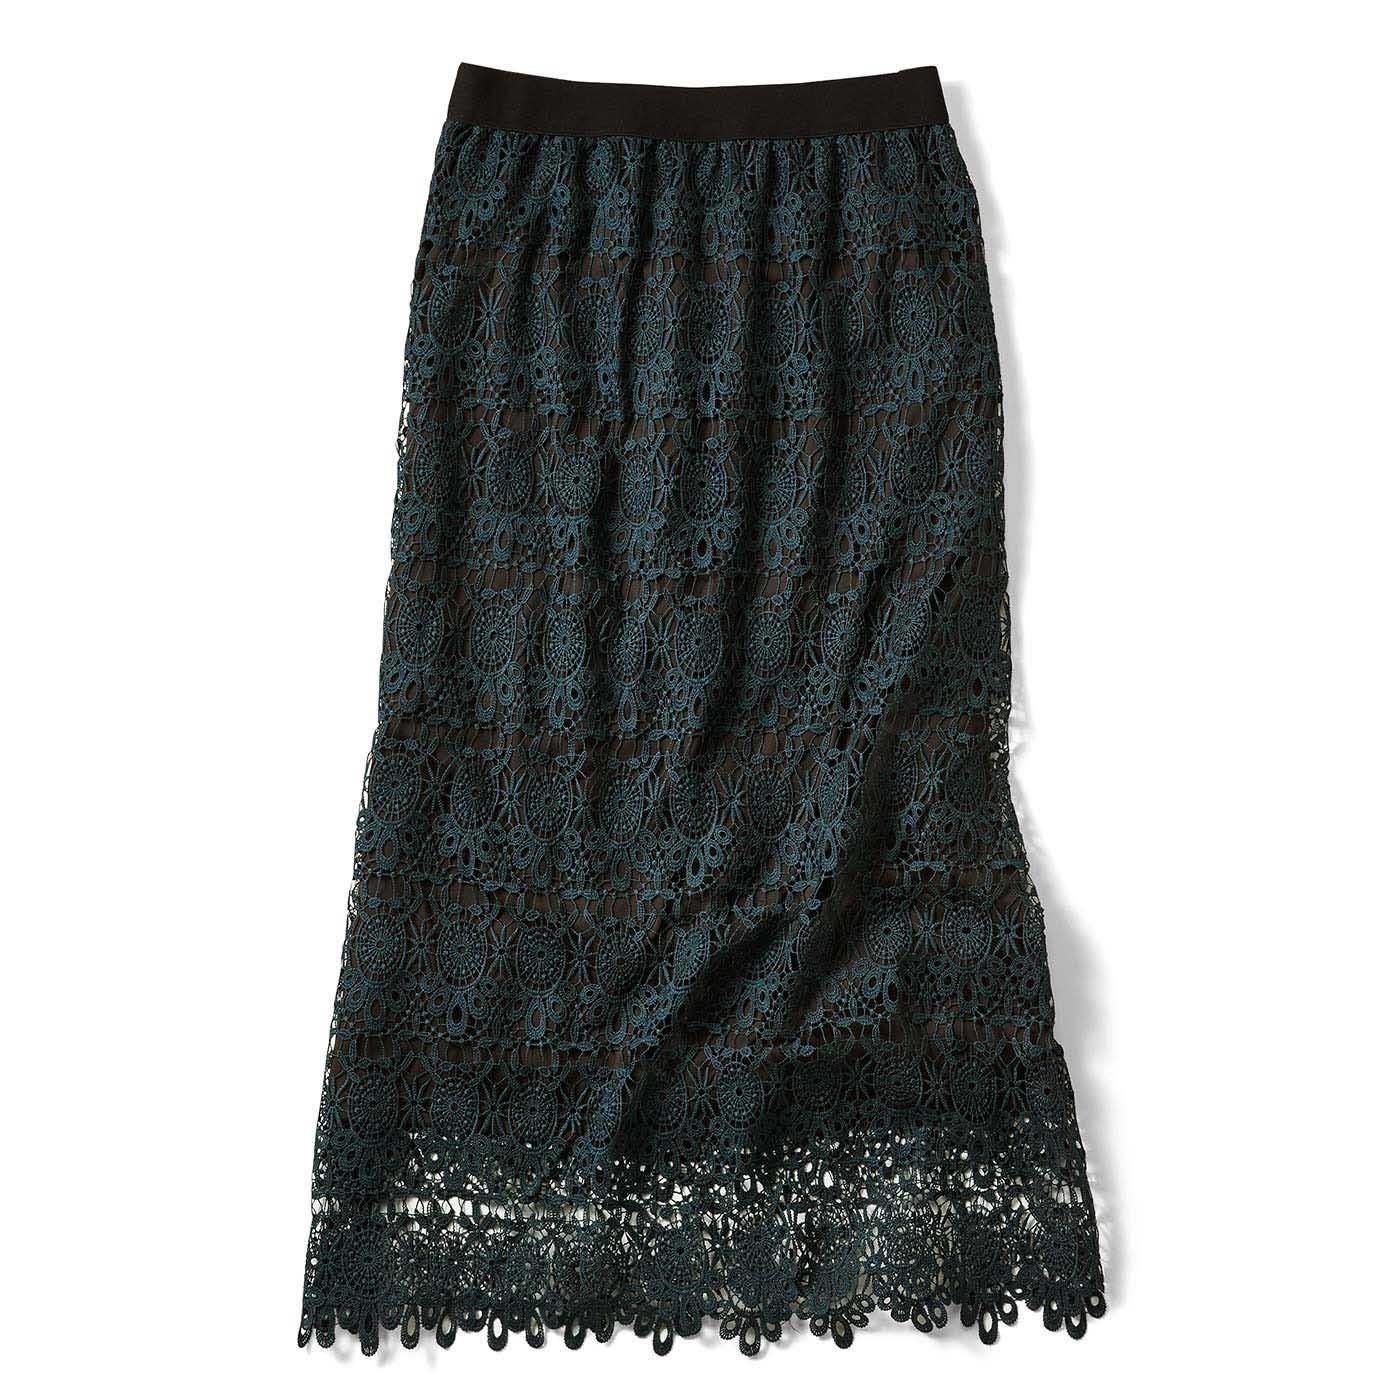 IEDIT 繊細レースで魅せるオトナしなやかレースのロングスカート〈ダークグリーン〉